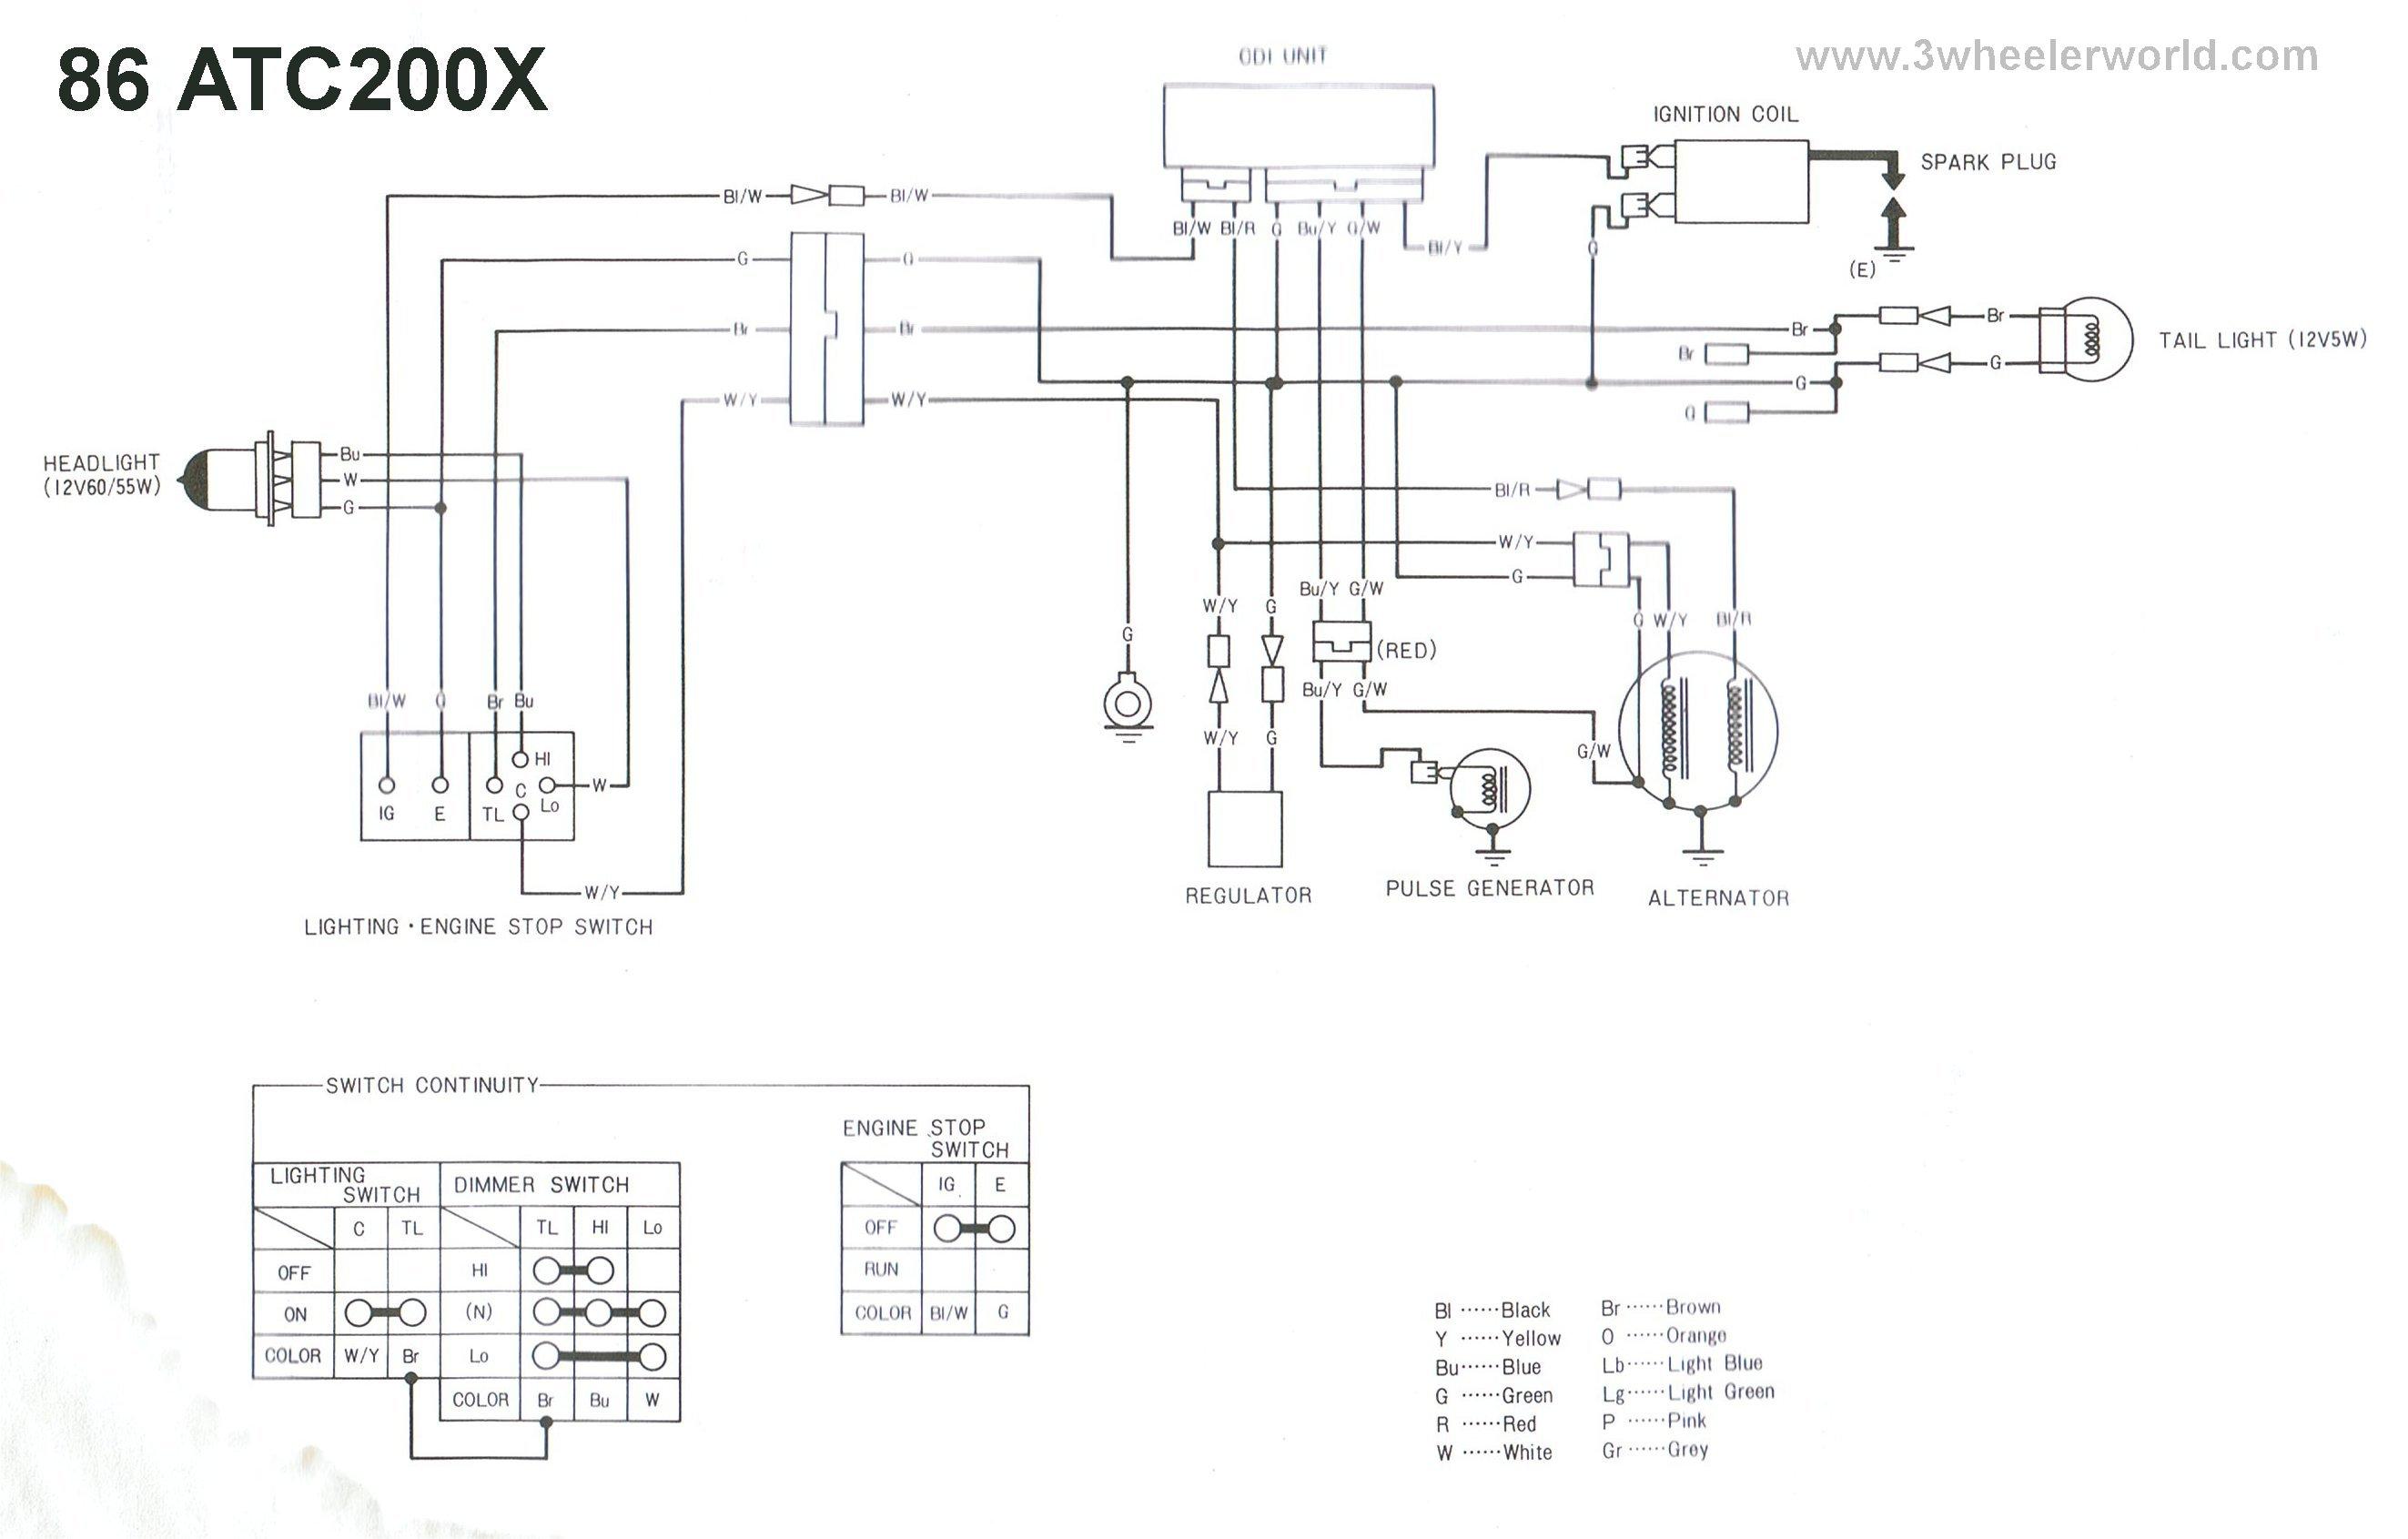 Stupendous Honda 200X Atc Diagram Carb Moreover Honda Atc 70 Parts Diagram Wiring Digital Resources Funapmognl